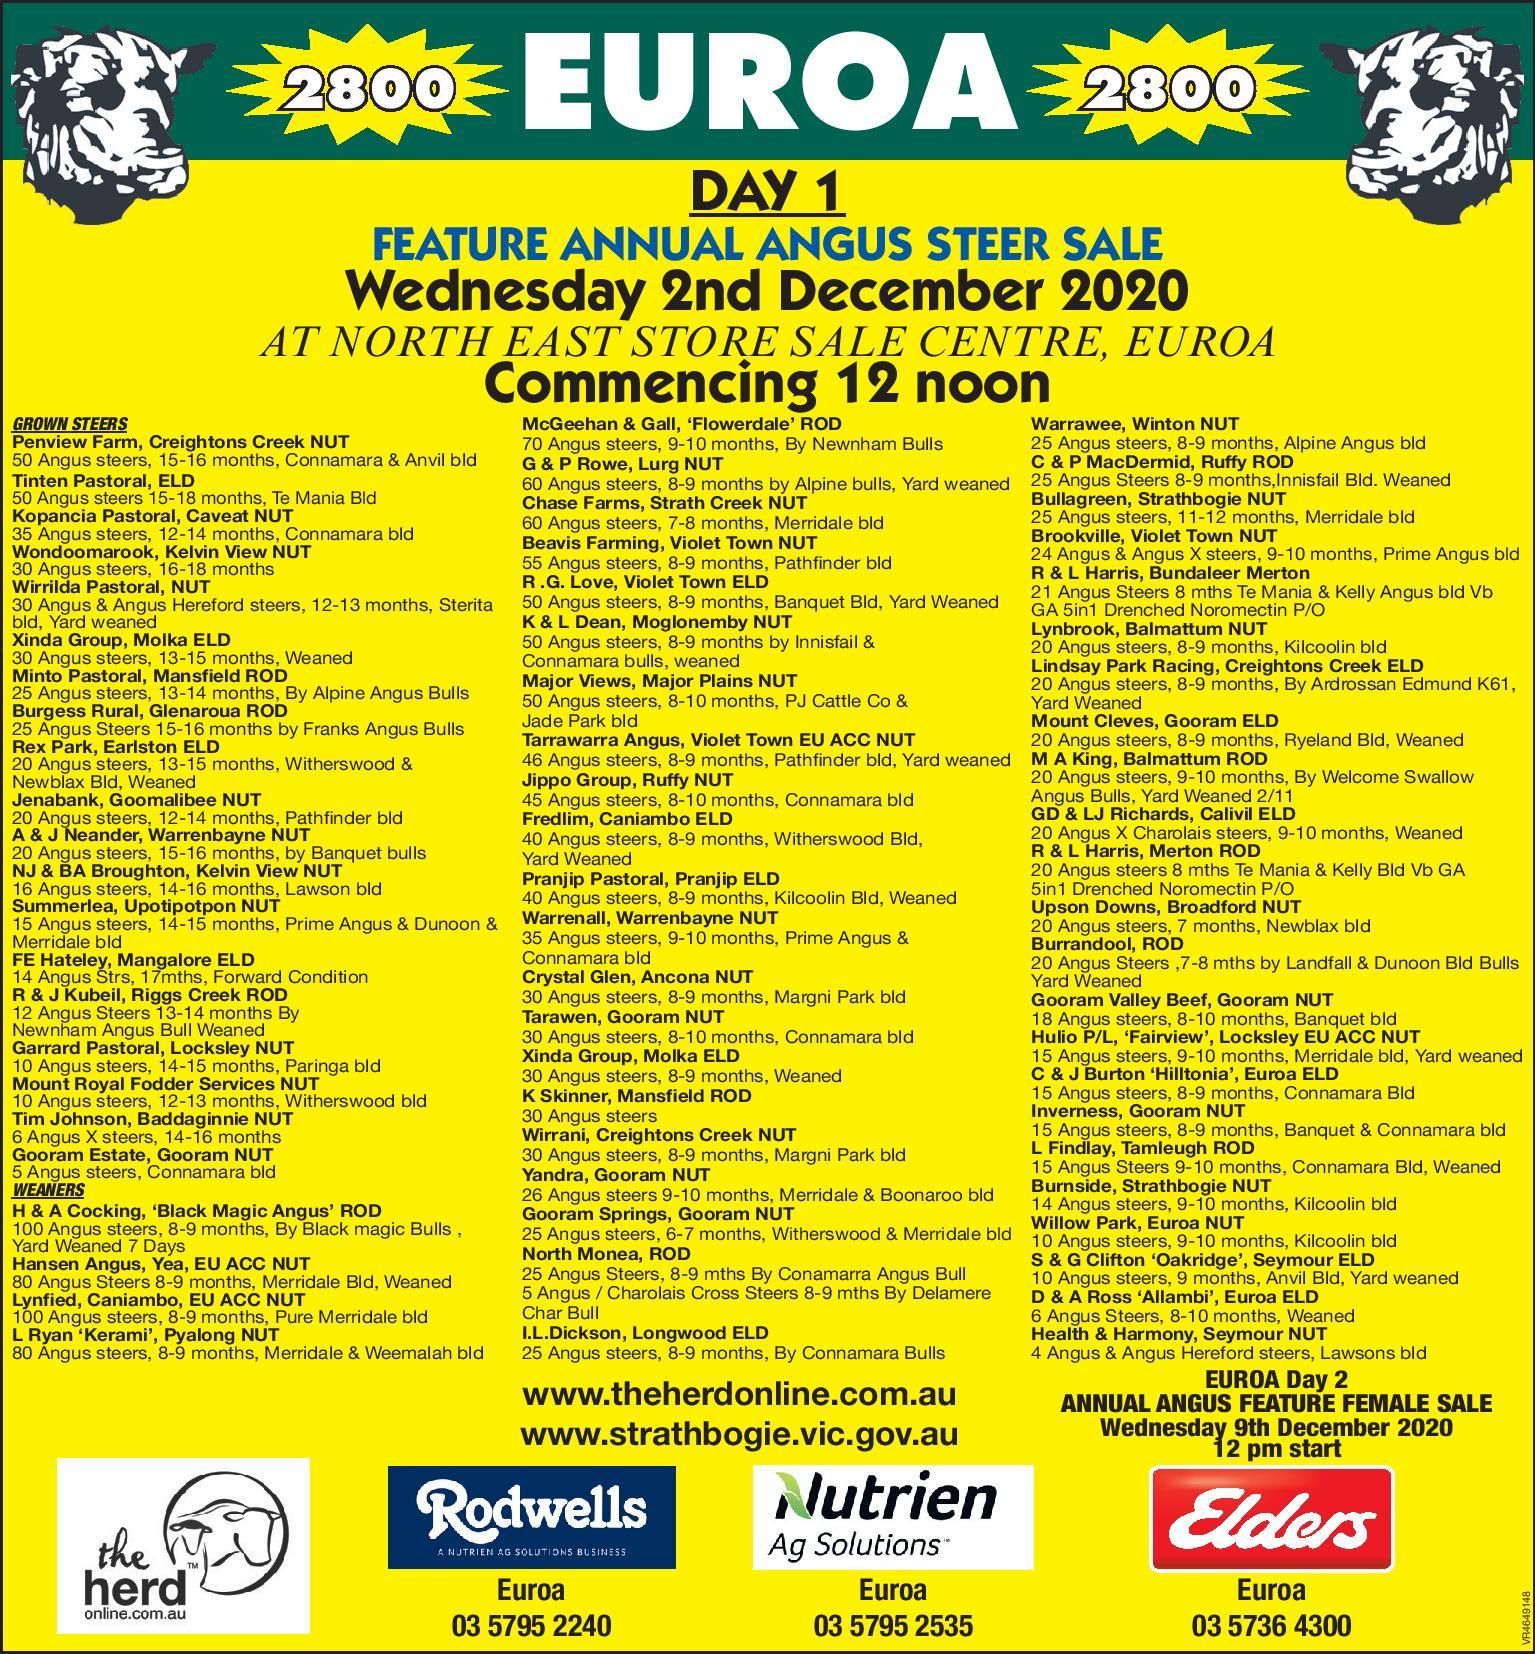 EUROA  DAY 1 FEATURE ANNUAL ANGUS STEER SALE